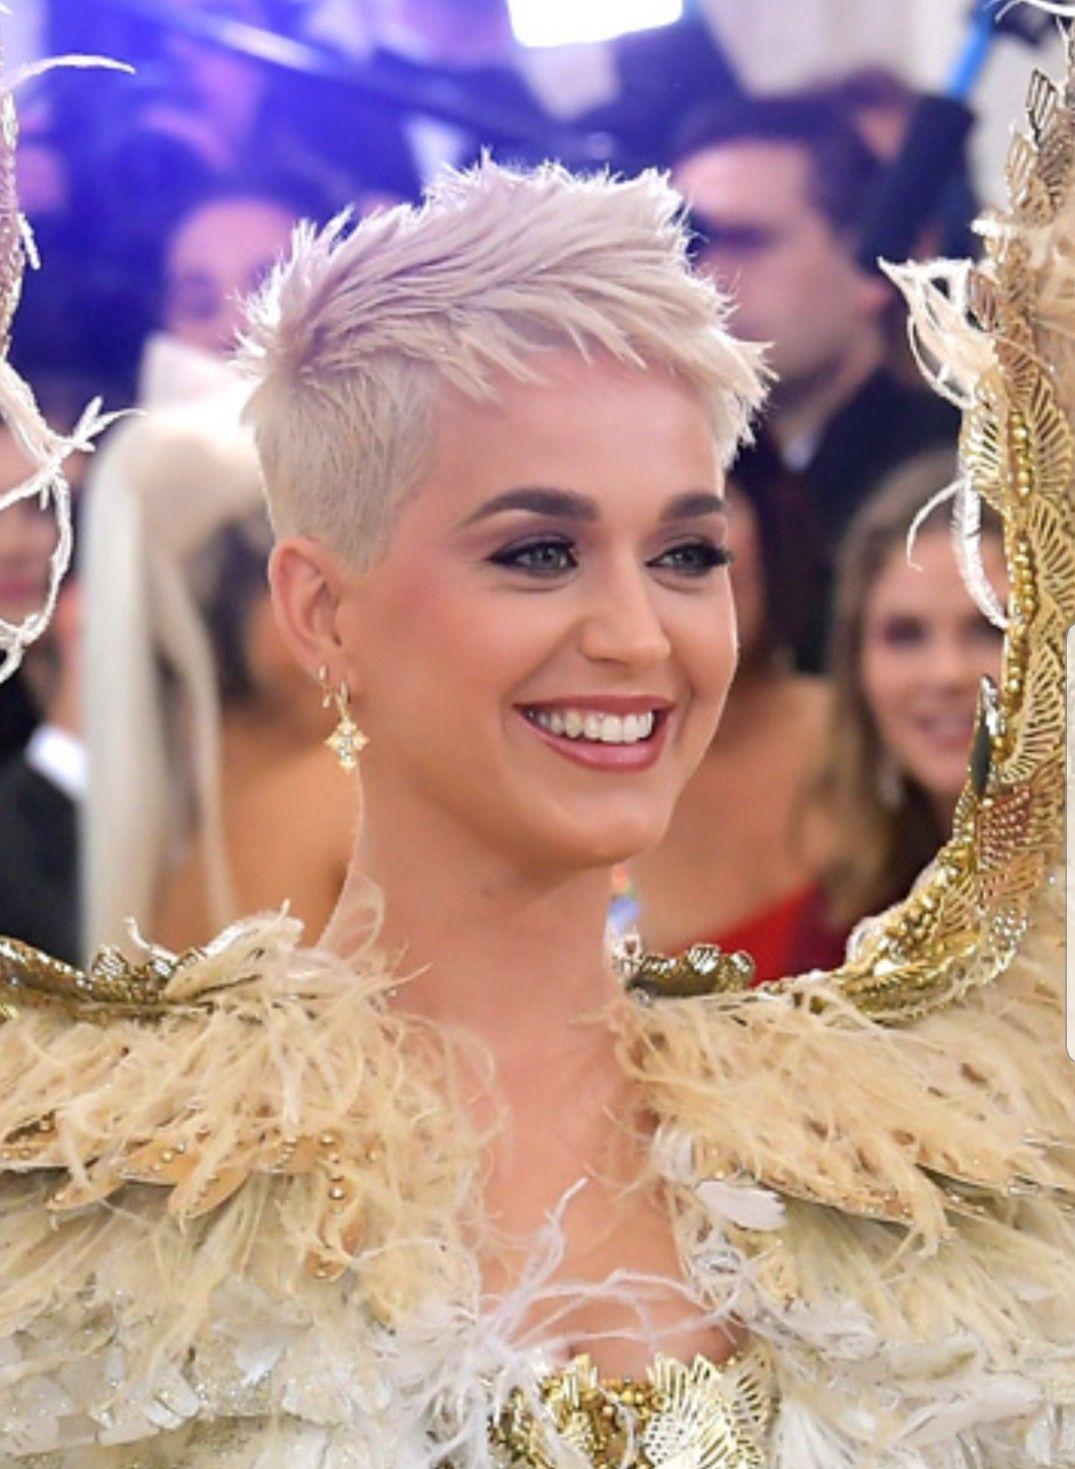 Katy Perry Kunden Frisuren Stylische Haare Kurzhaarfrisuren Und